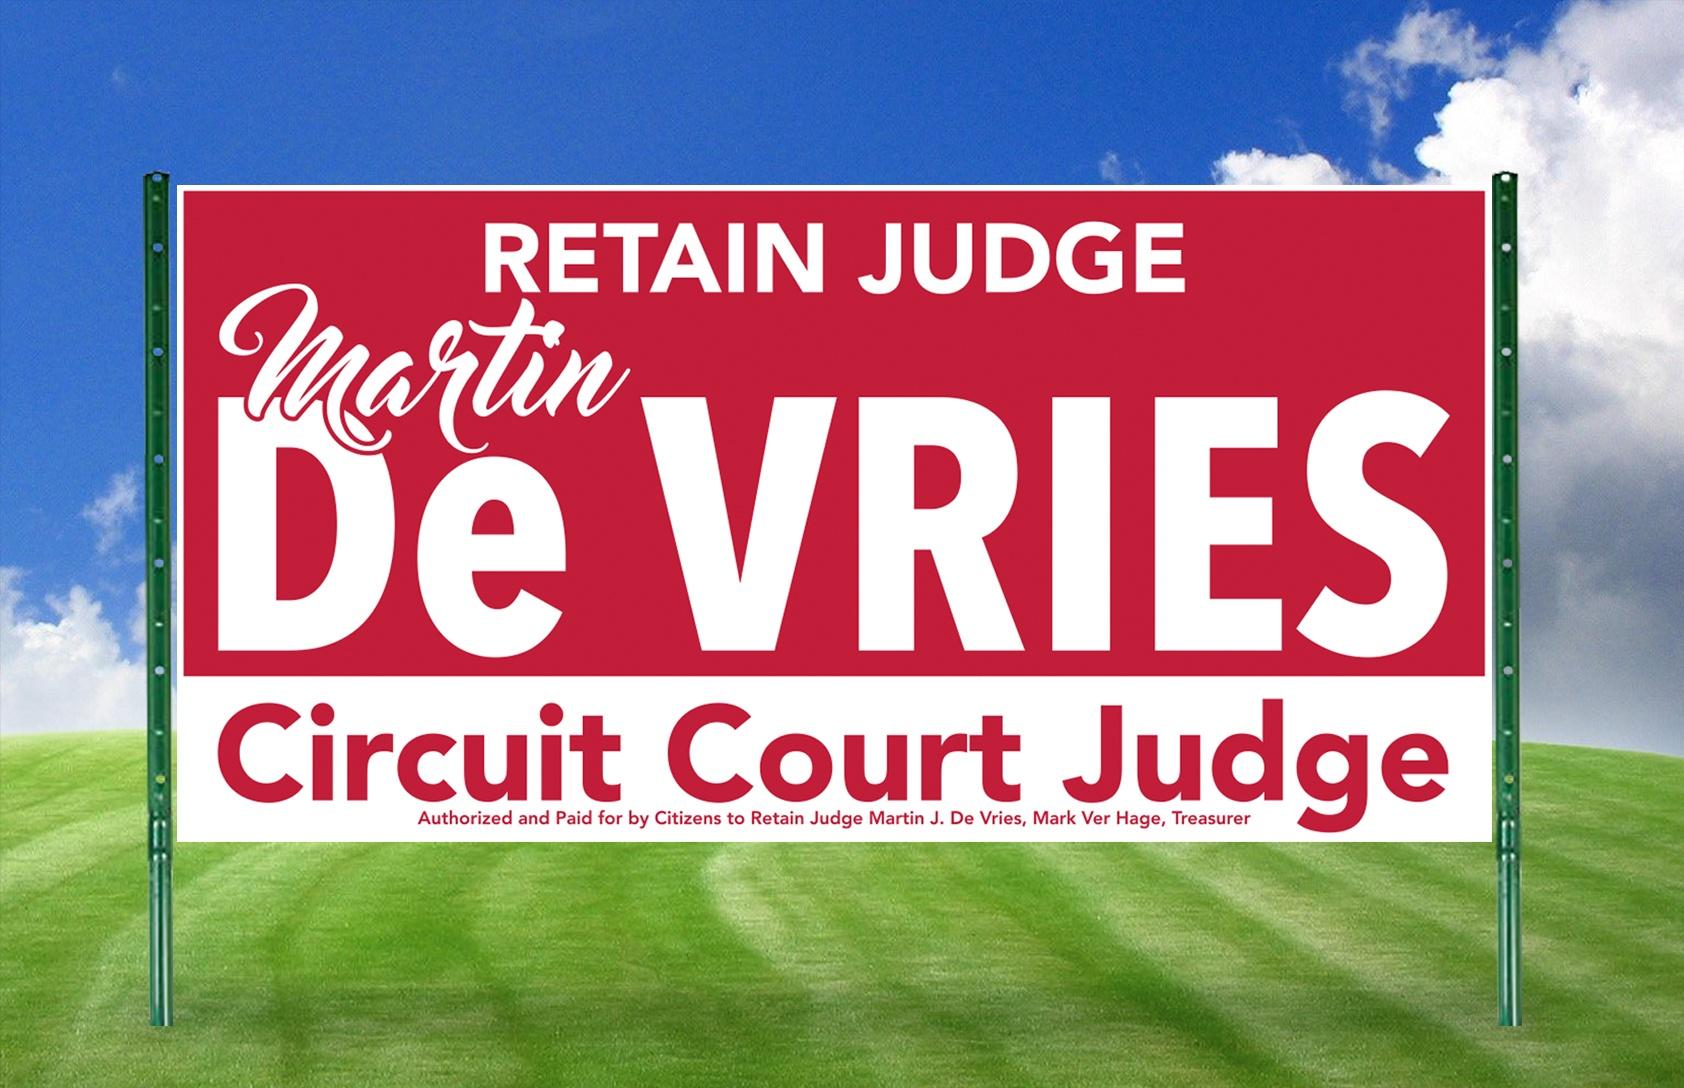 Retain Judge Martin De Vries 8′ x 4′ Coroplast Yard Signs